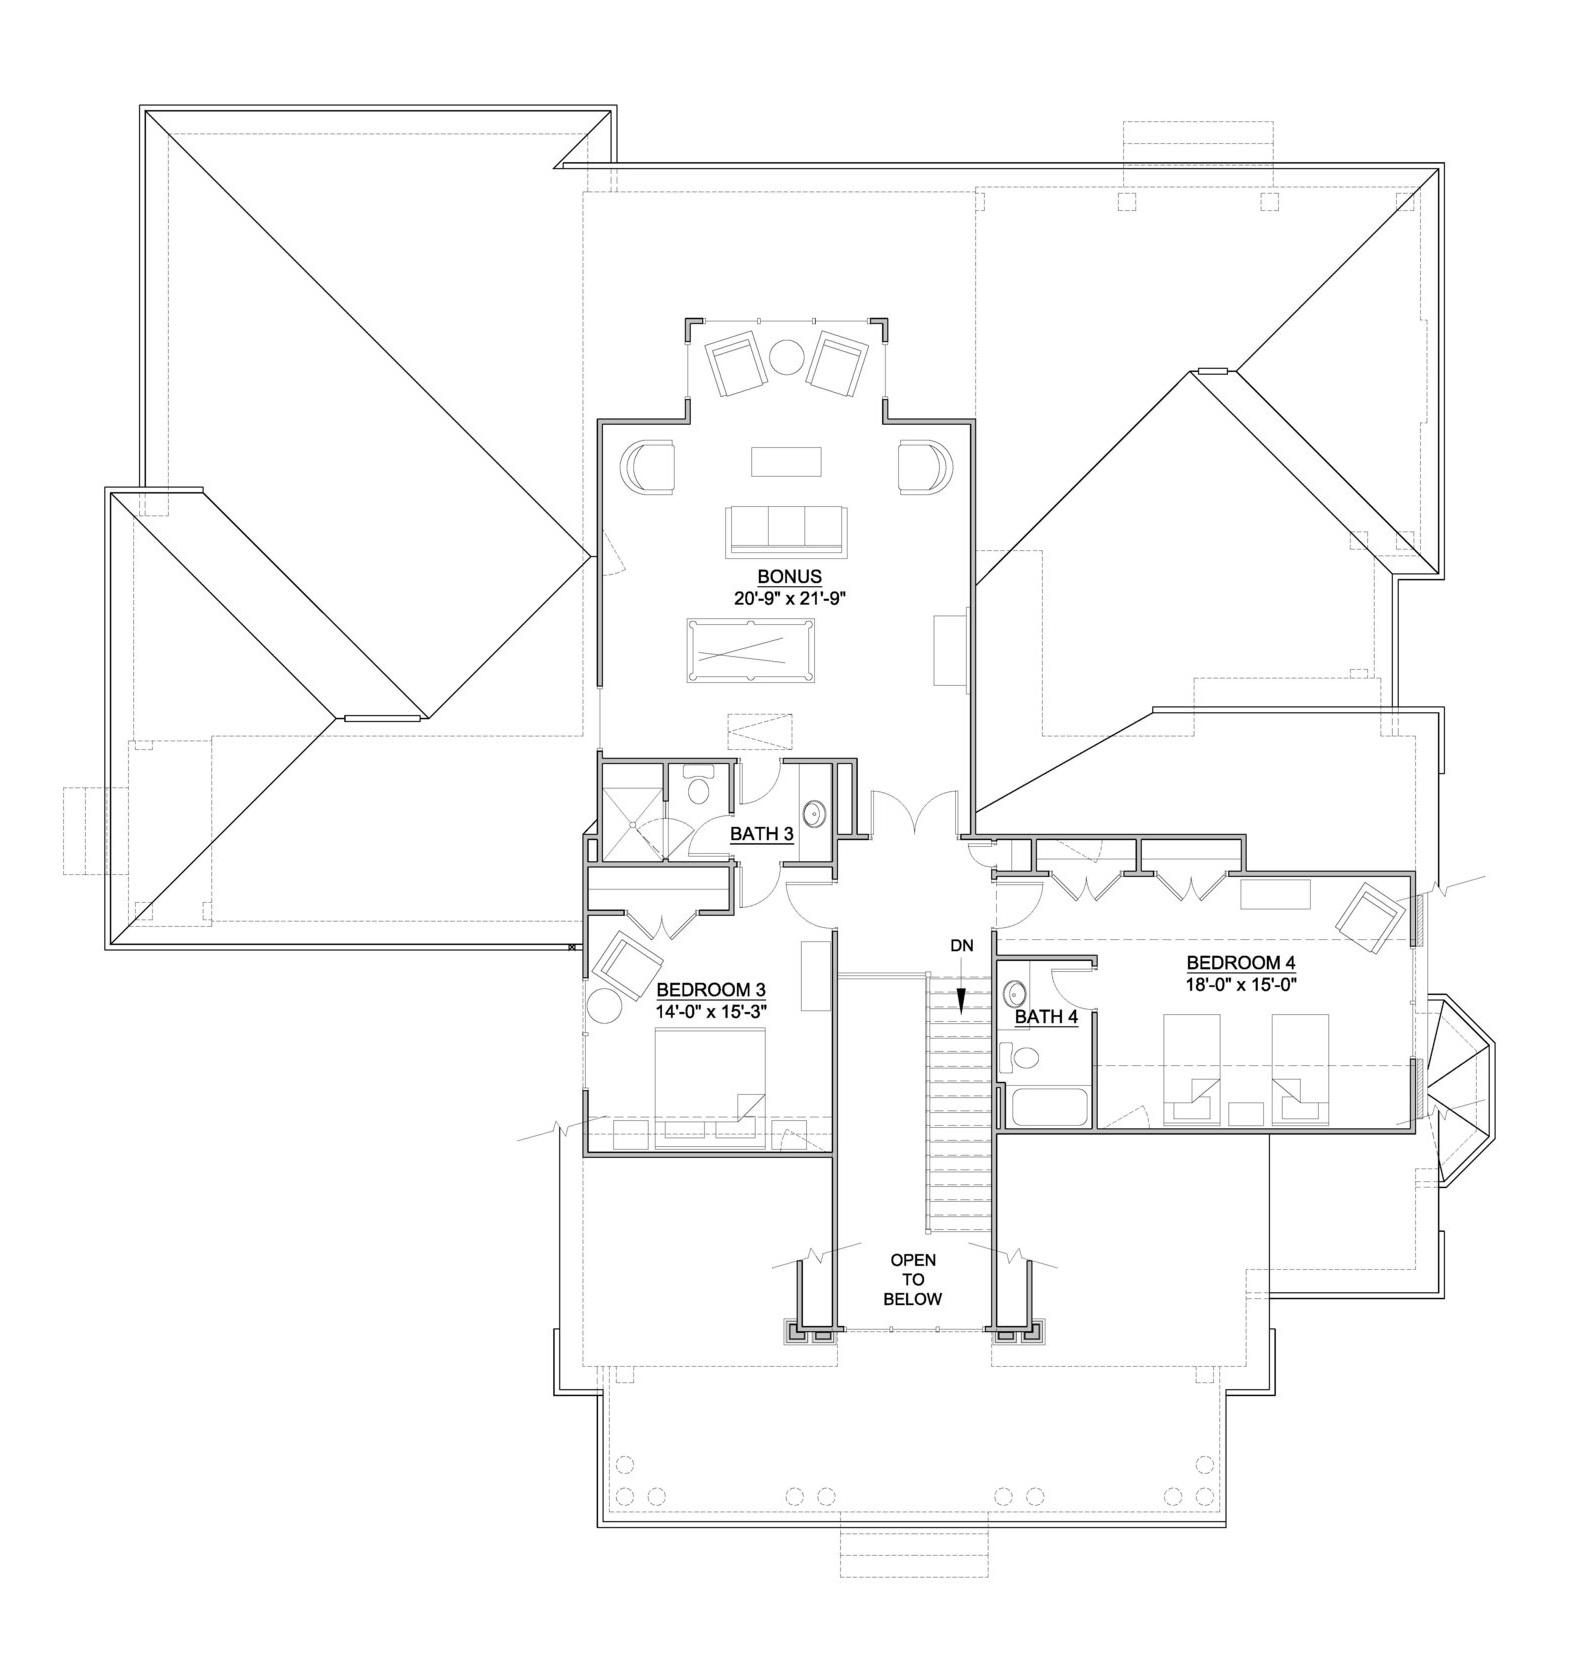 Riverchase_Eaton+C+CRAWL_%283%29+Second+Floor+Plan+%5B24x36%5D.jpg